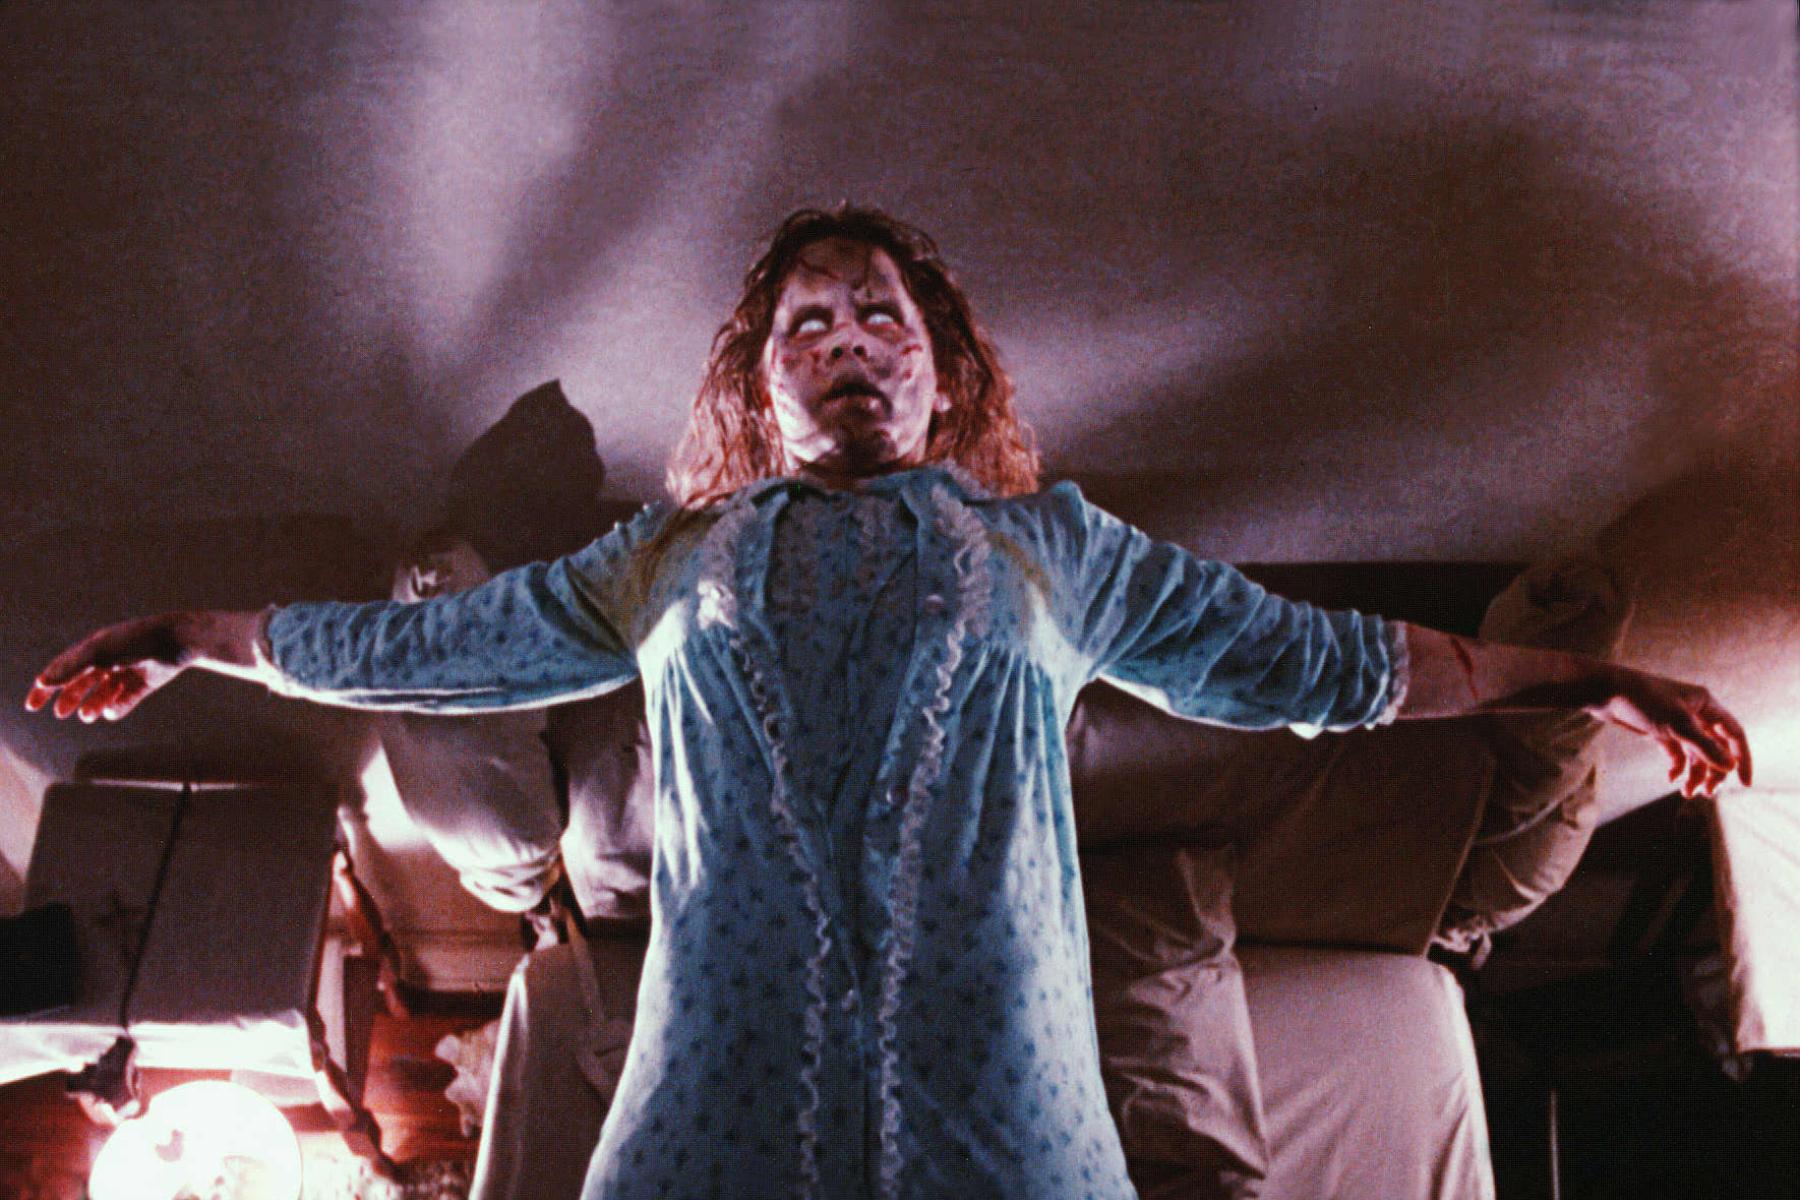 Horror web series The-Exorcist